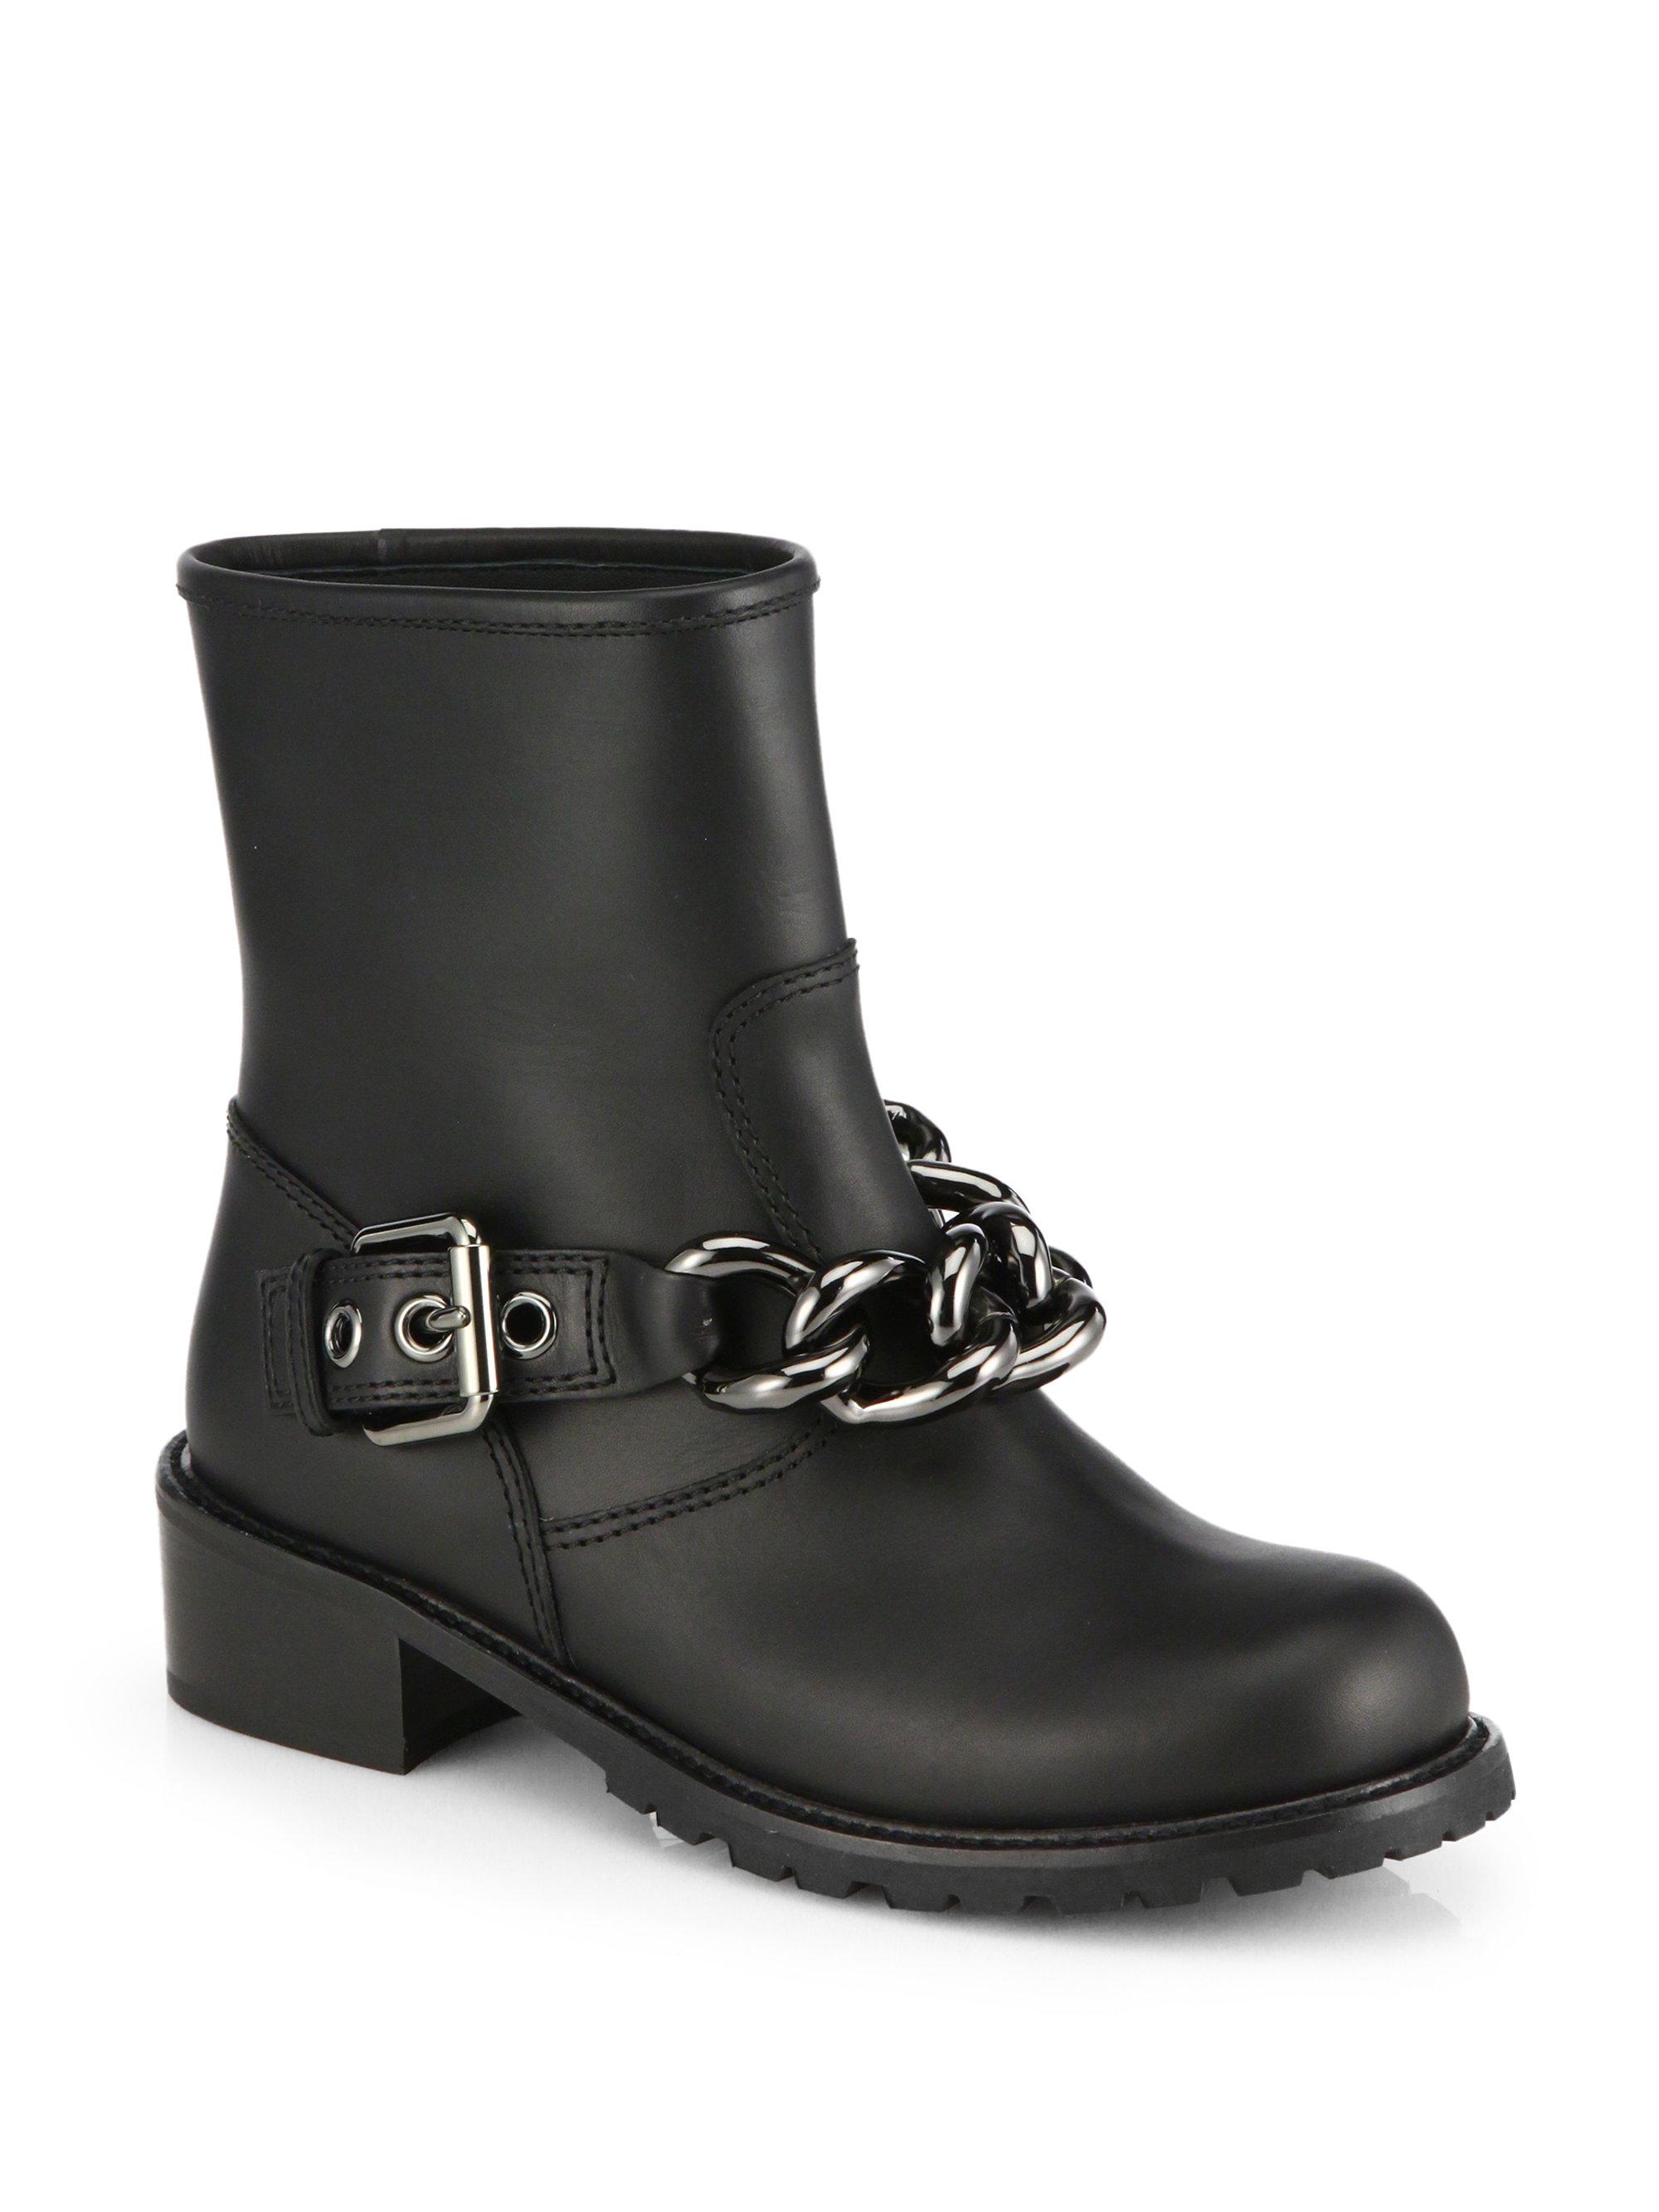 5fa908bc97b67 Giuseppe Zanotti Moto Chain-Detail Leather Boots in Black - Lyst